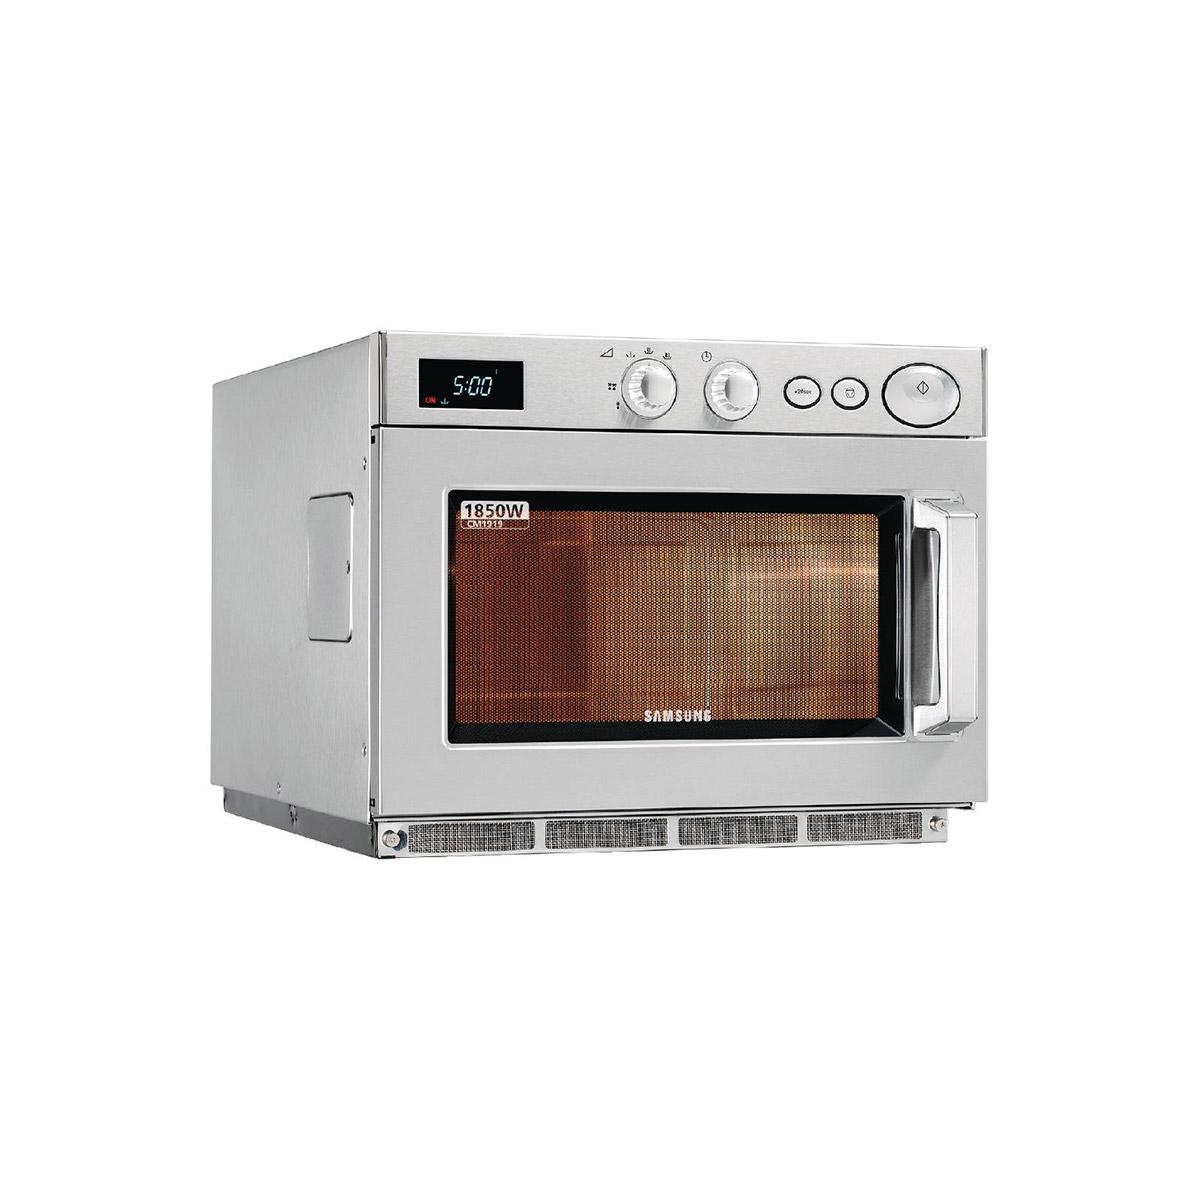 Samsung Manual Microwave Oven CM1919